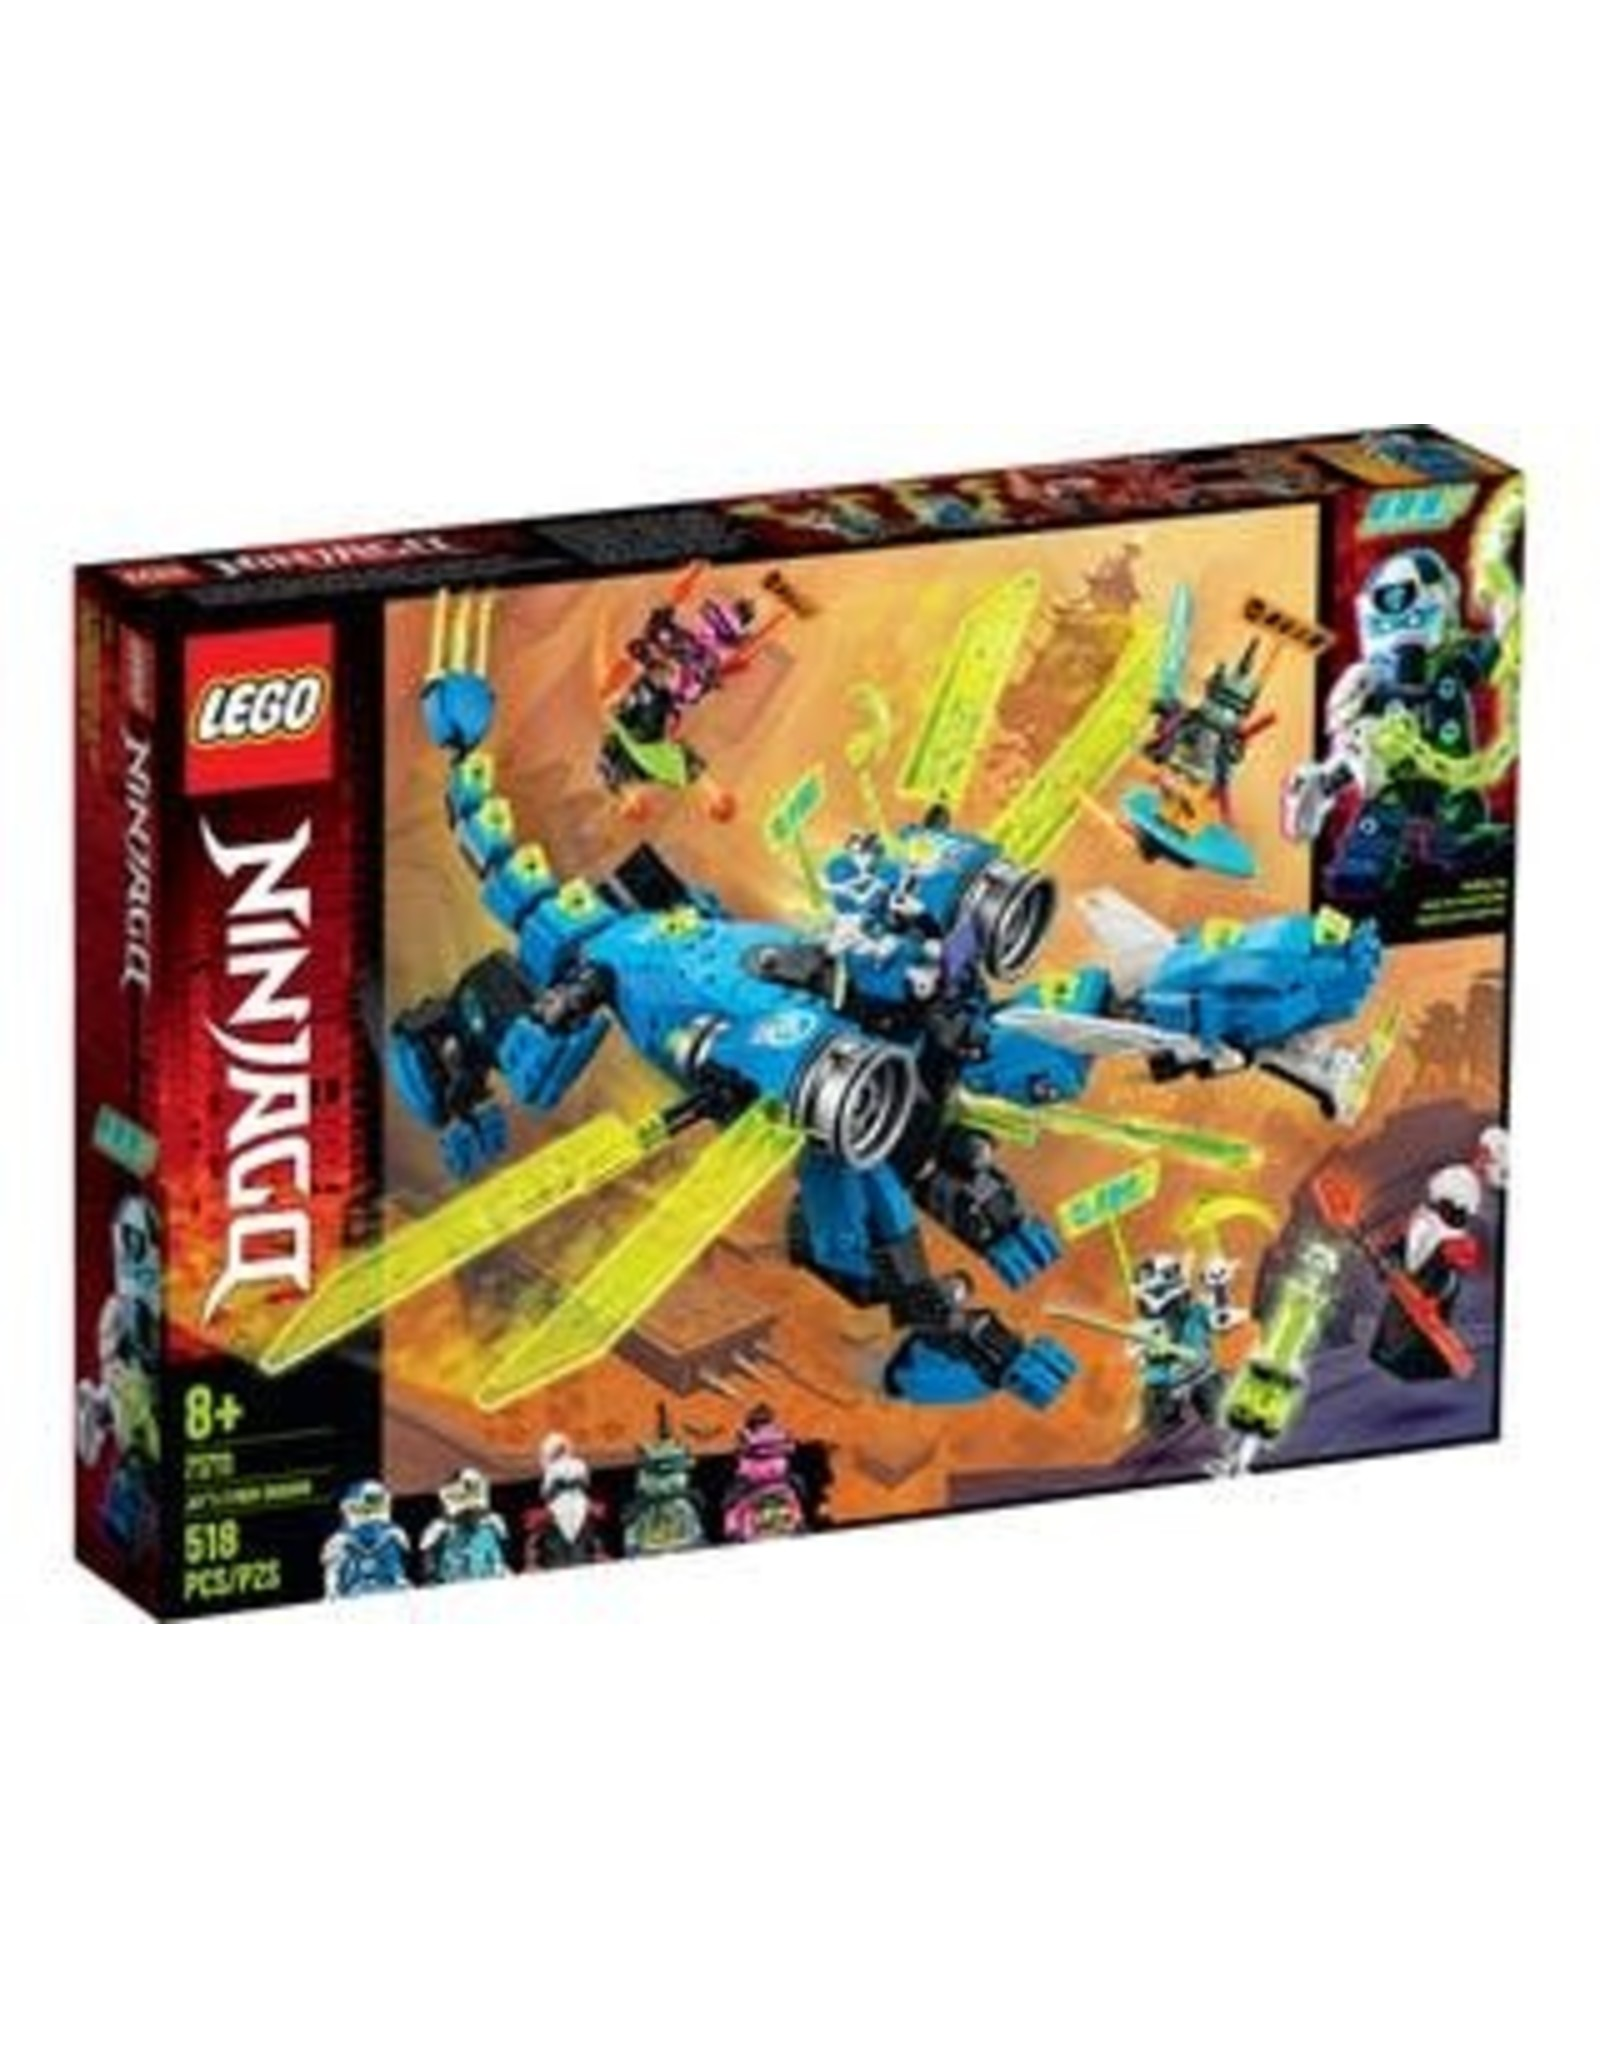 LEGO LEGO Ninjago Jay's Cyber Dragon